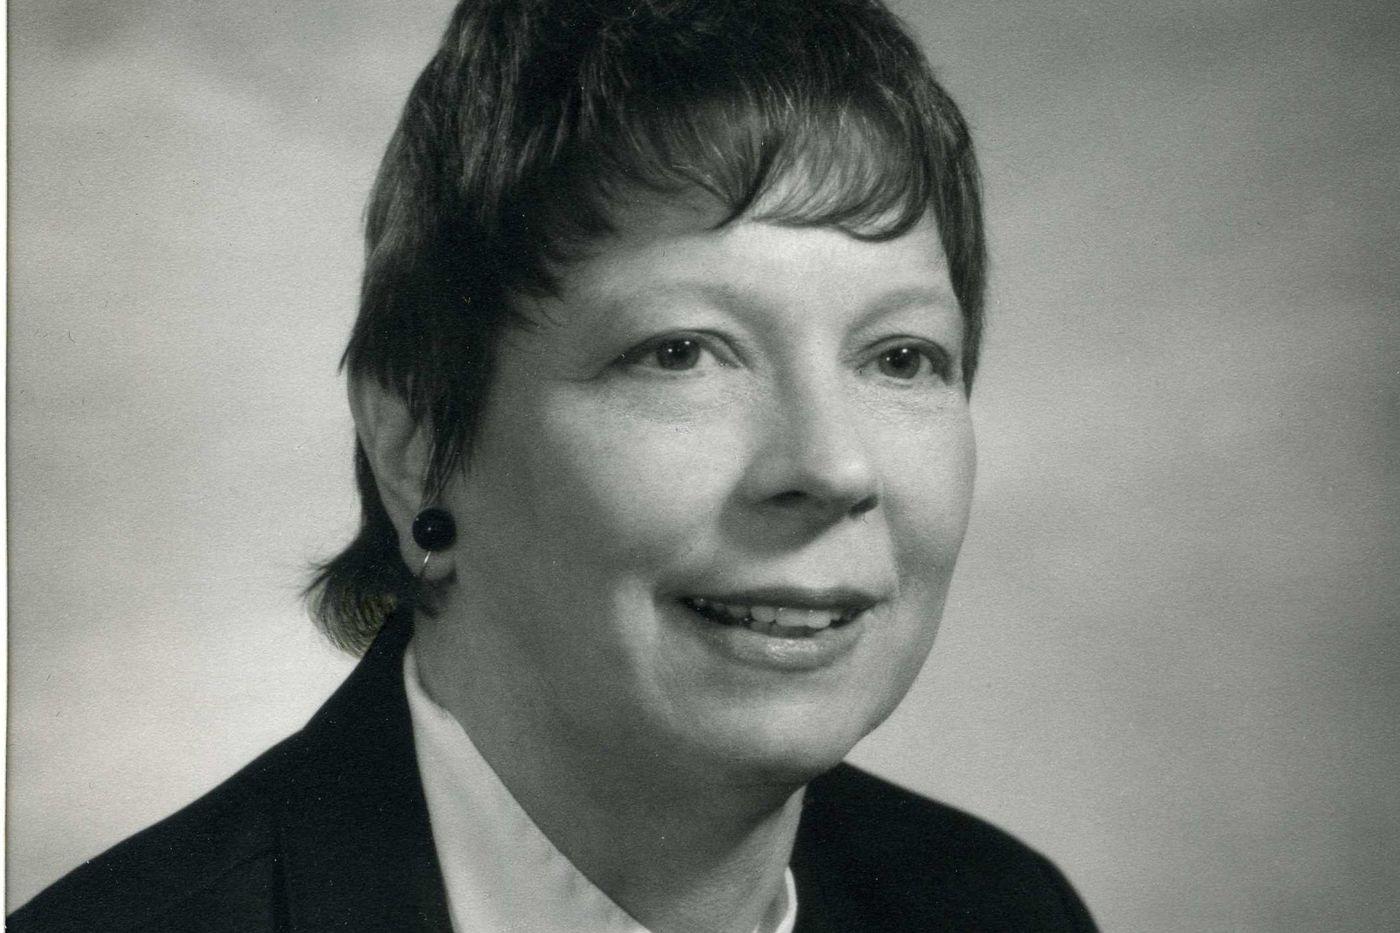 Anna C. O'Riordan, 86, pediatric cardiologist and sailor